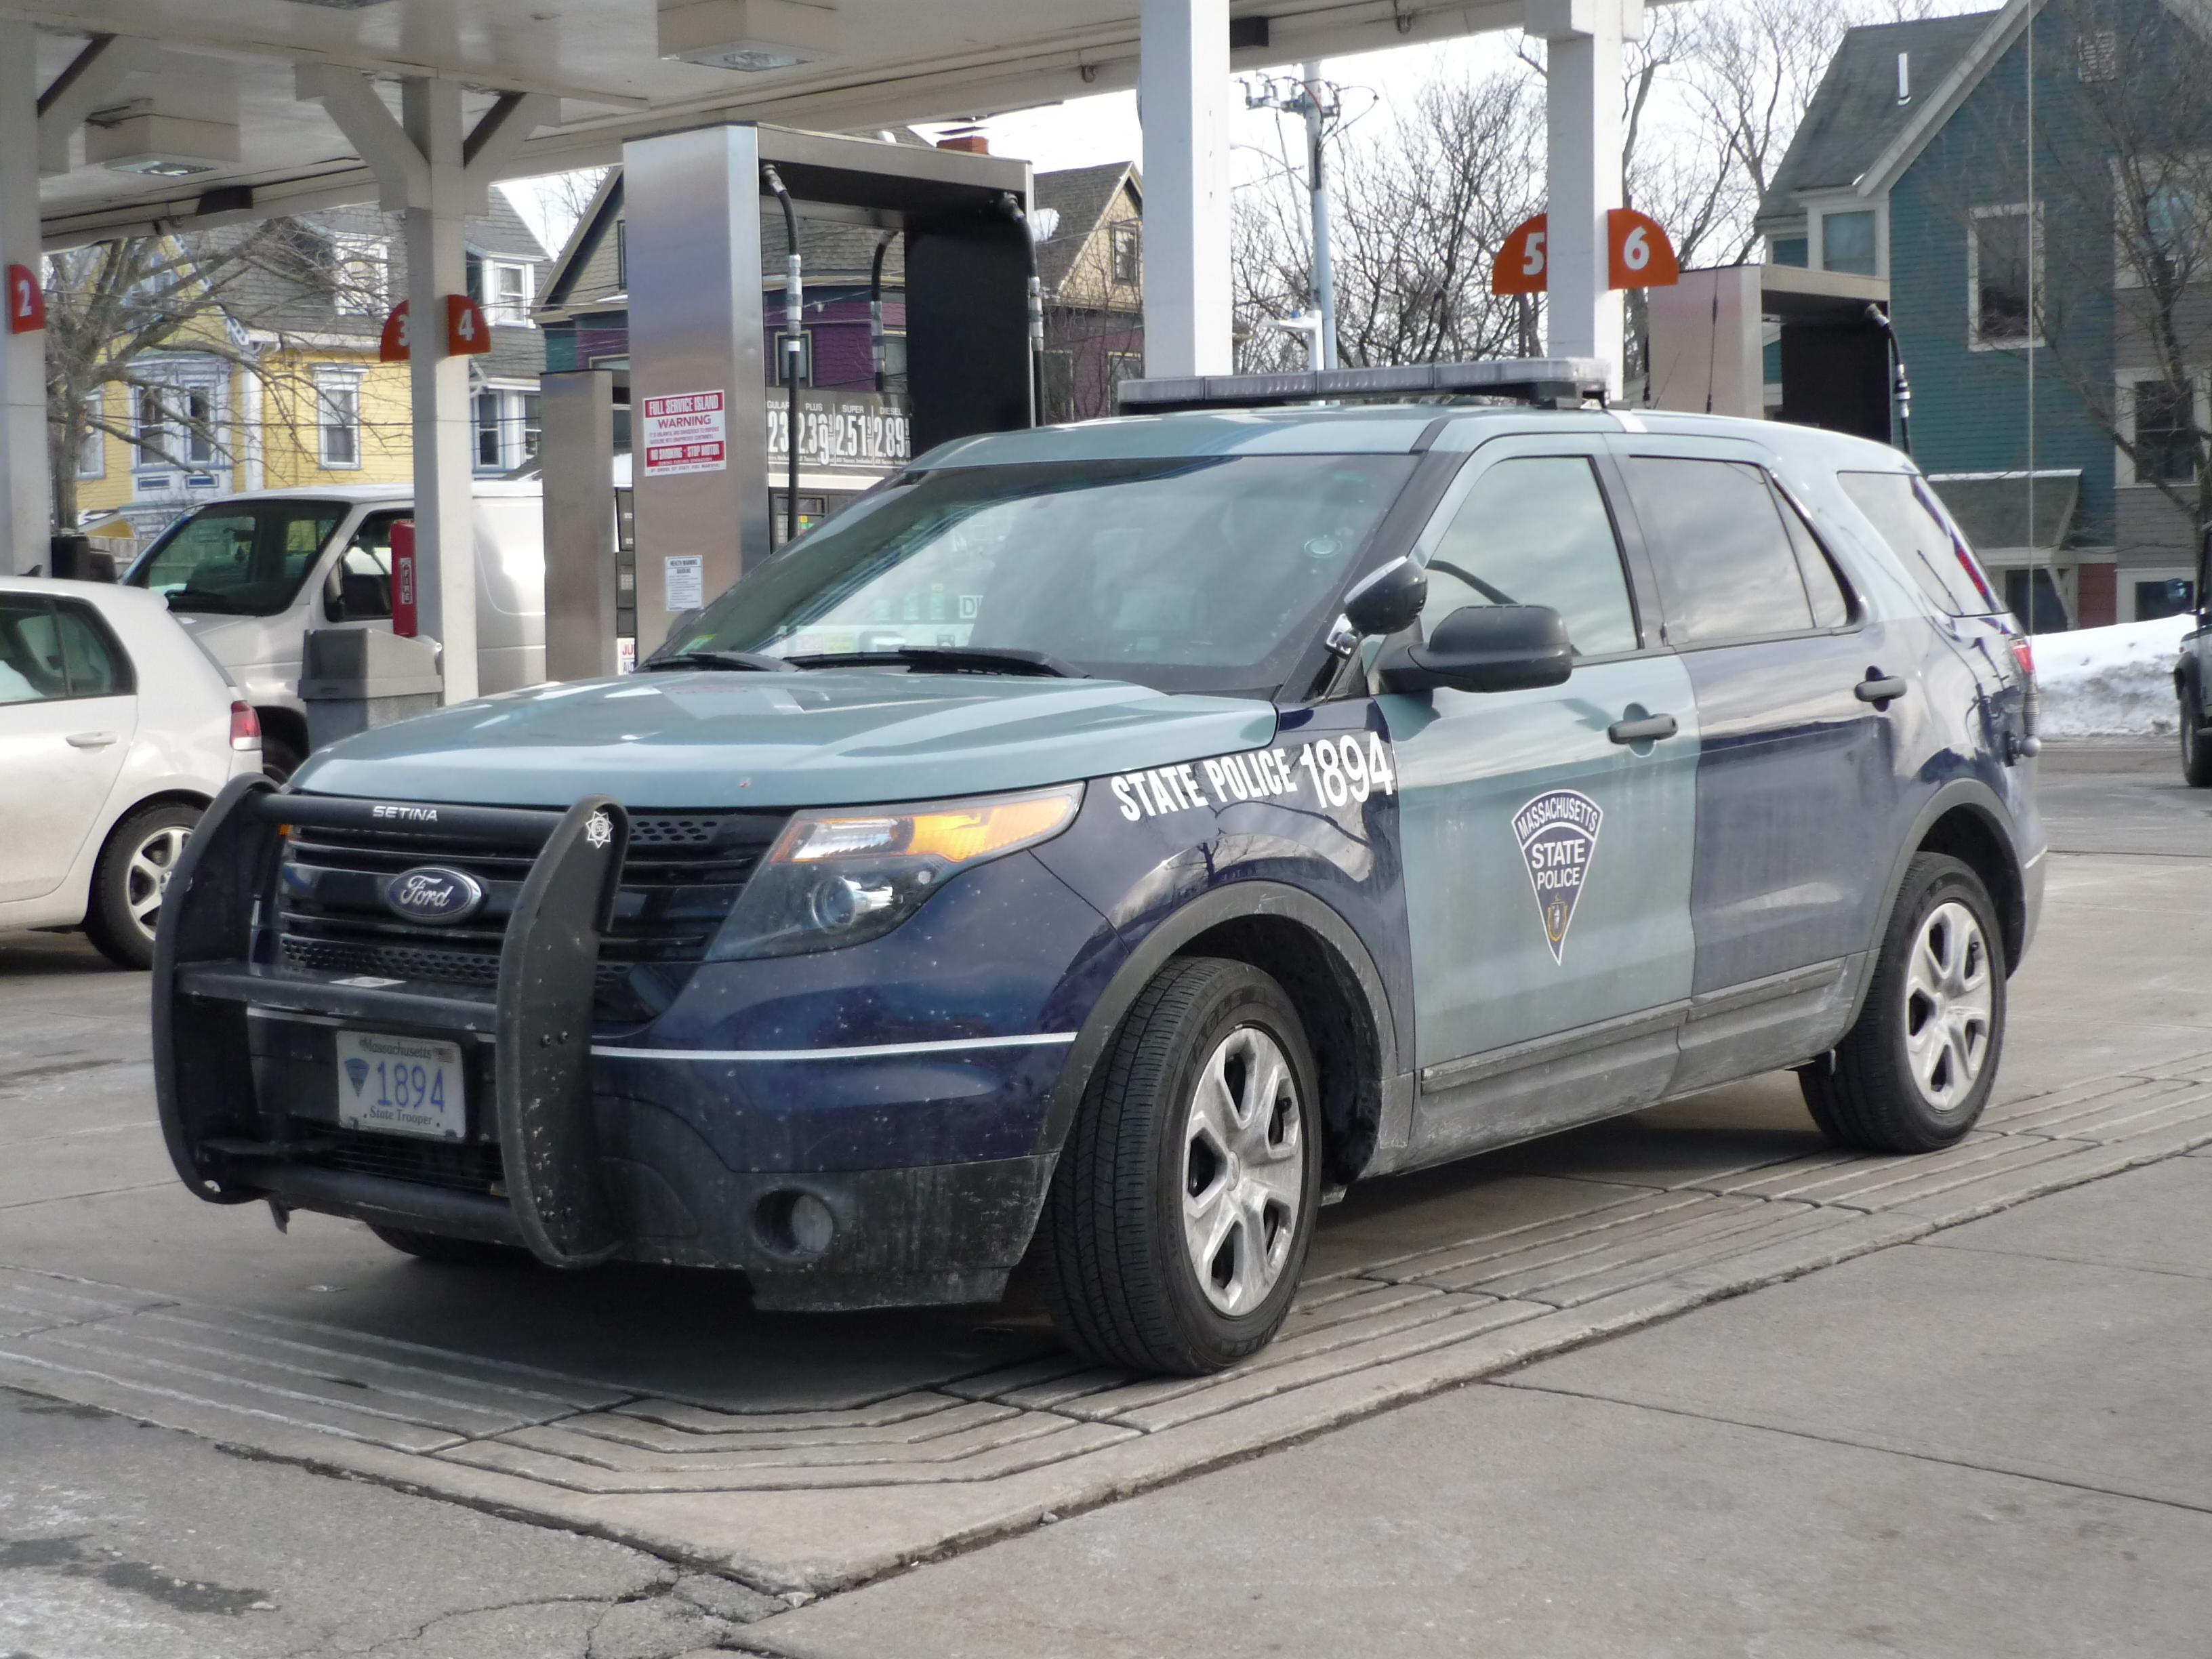 File:Massachusetts State Police Ford Police Interceptor Utility-2